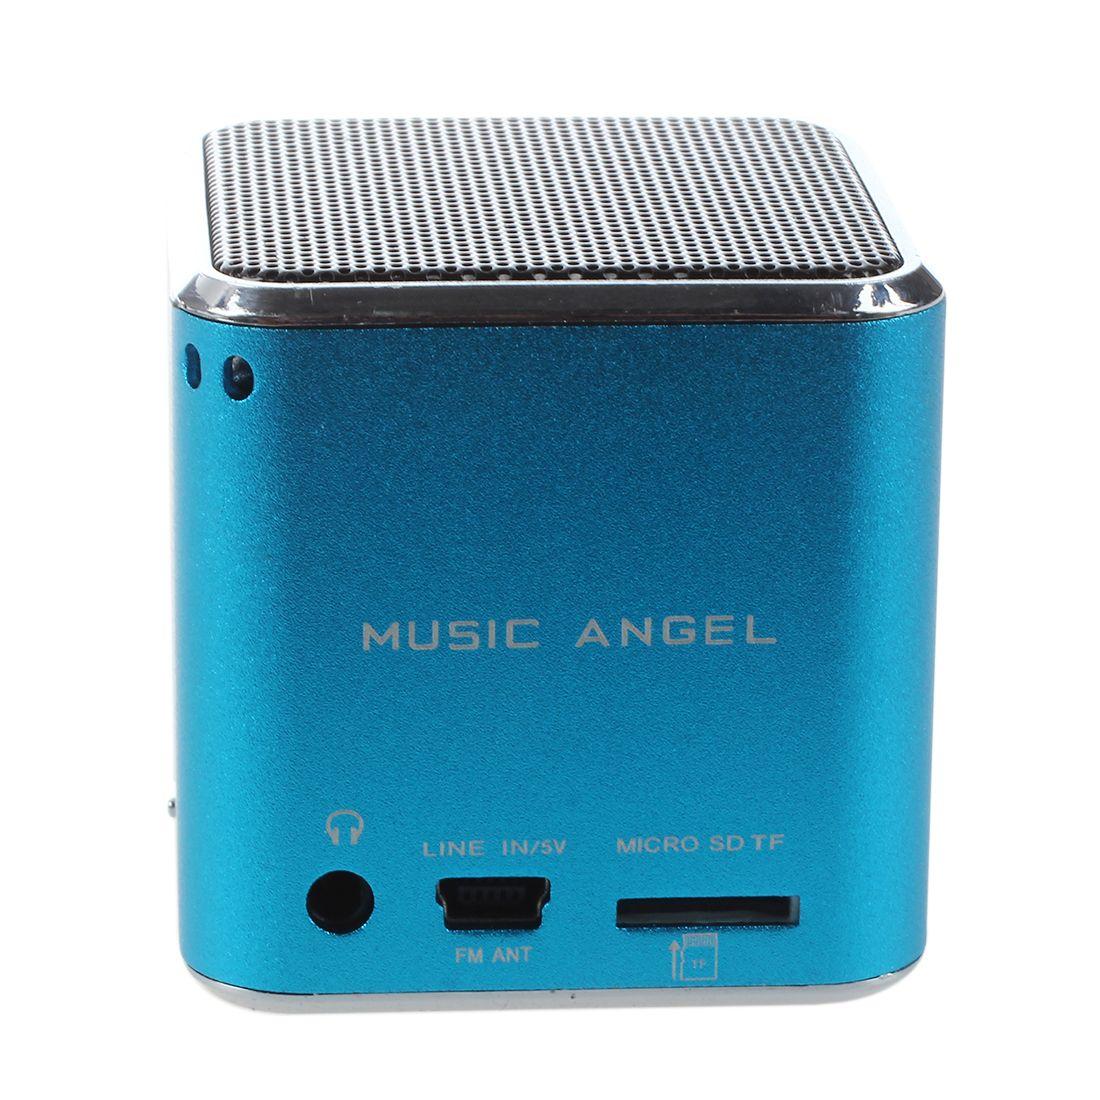 Music Ange Handsfree Blue Spec Dan Daftar Harga Terbaru Indonesia Hm60 For Samsung Purple Daditong Angel Tf Portable Mini Digital Speakers Speaker Online